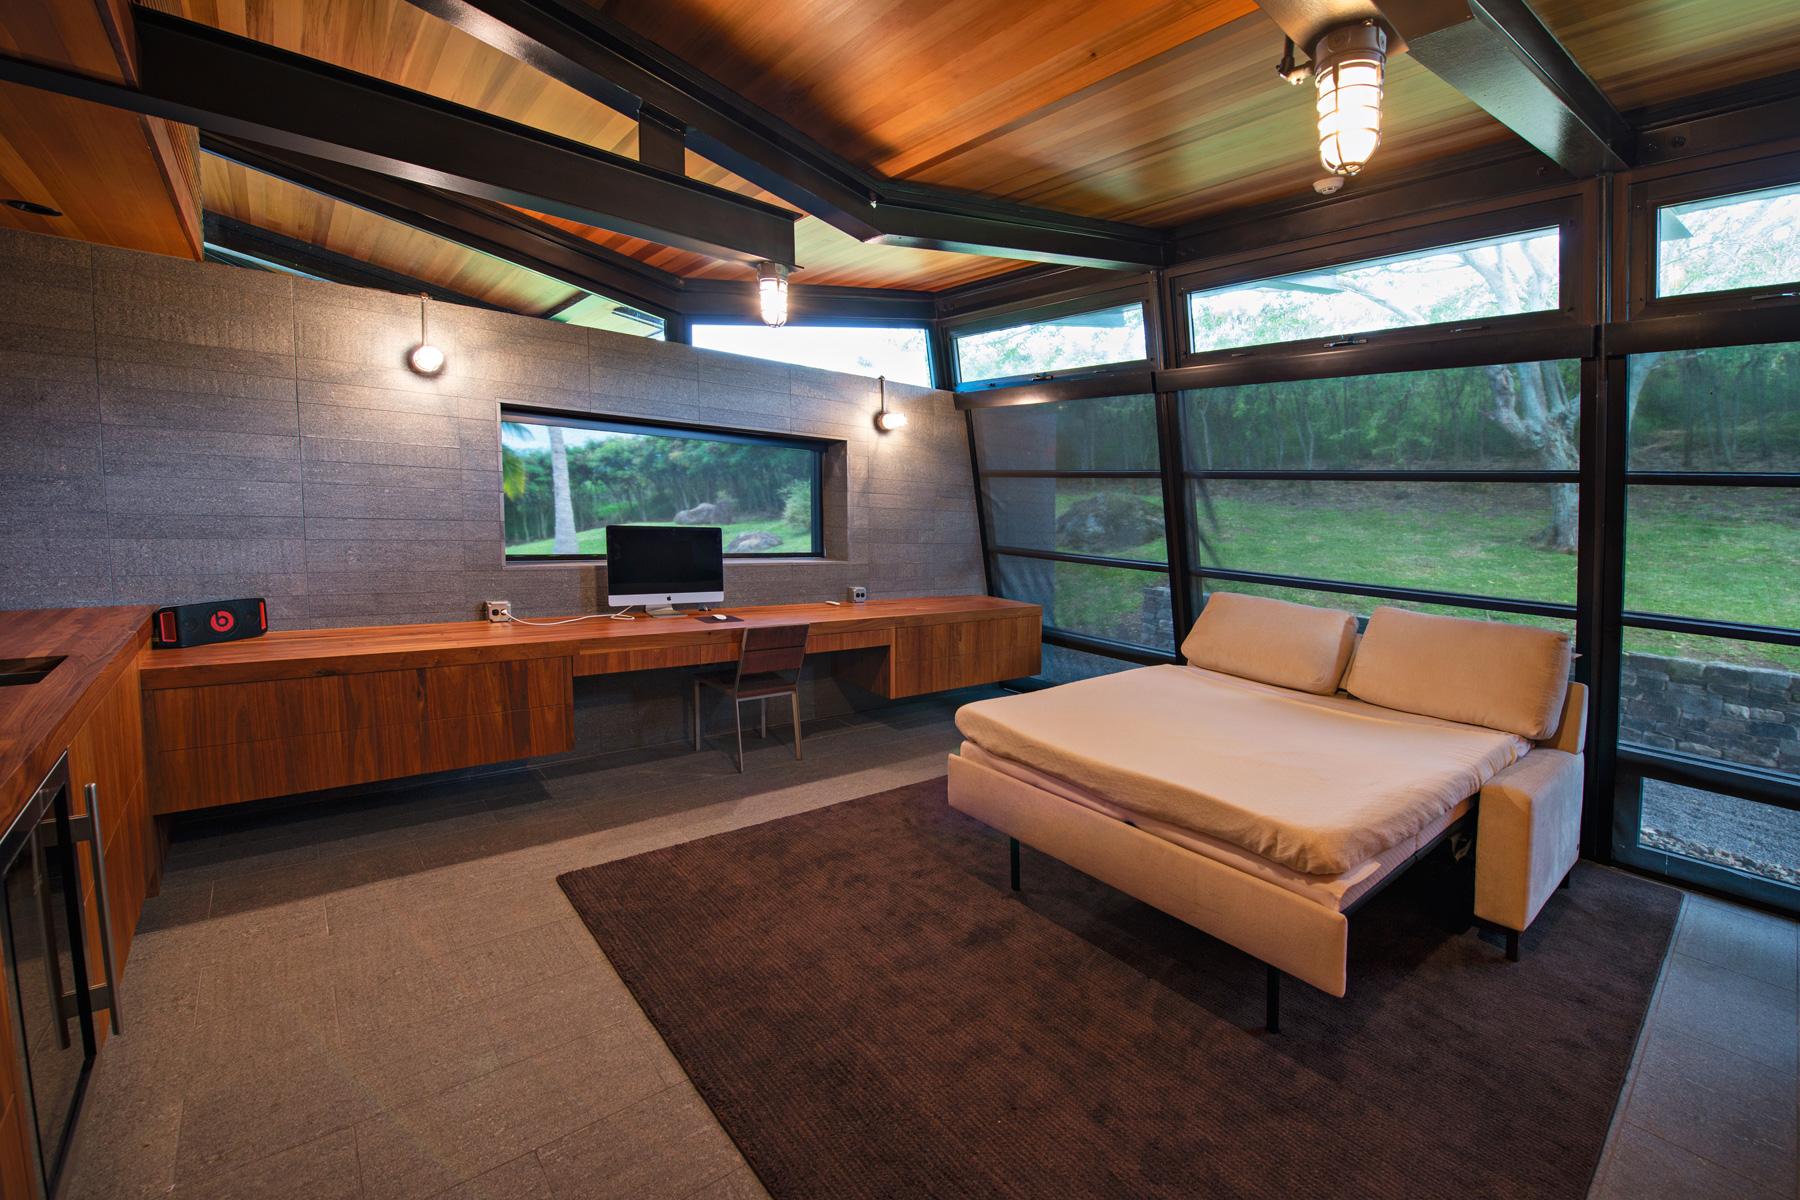 Honolua Bay Kapalua House for Sale Peter Lik Master Suite Den